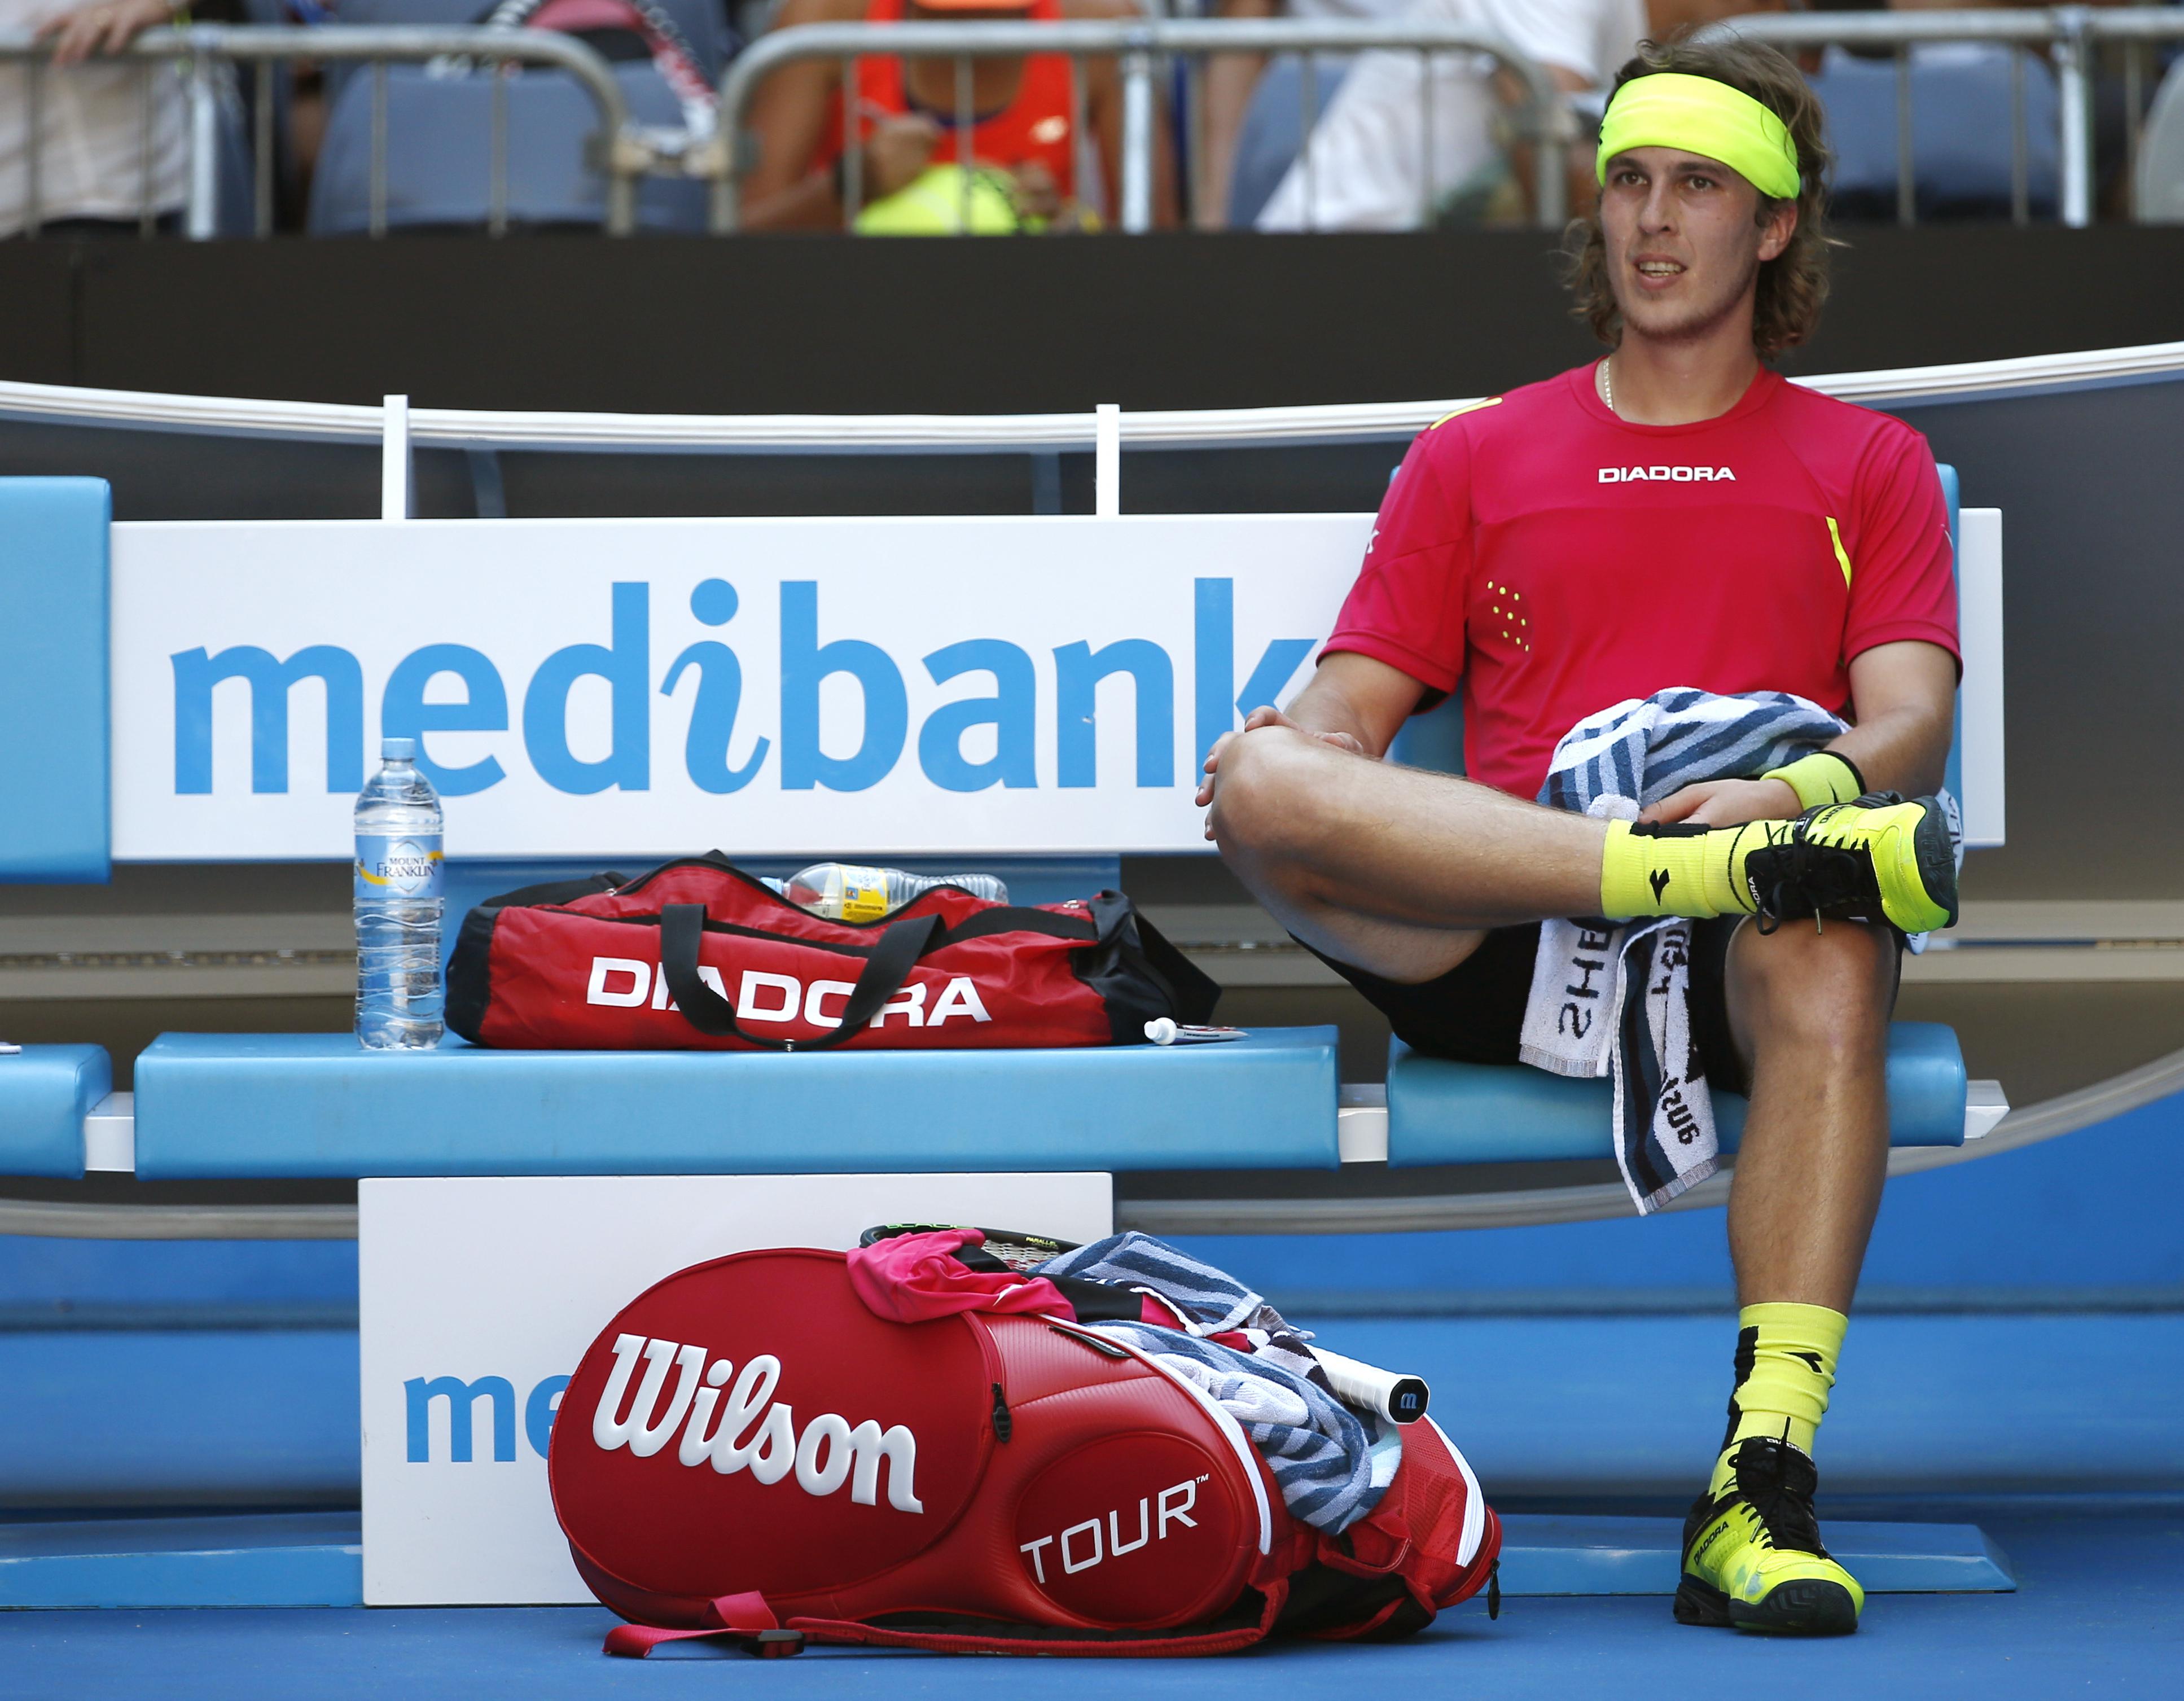 australian_open_tennis-f94389c6e0aa4ddfb_r8803.jpeg